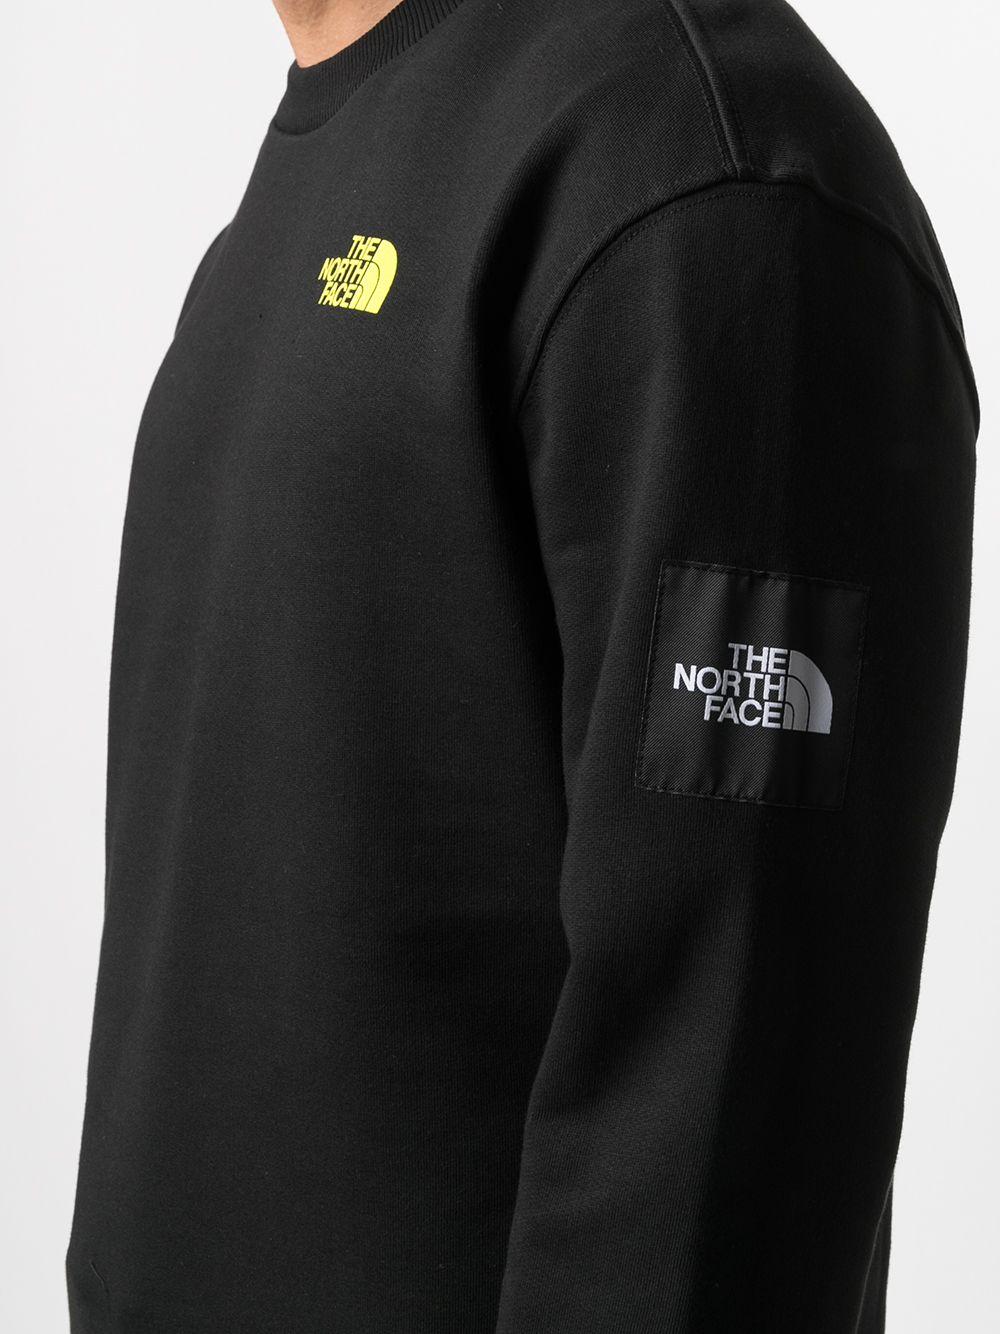 LOGO SWEATSHIRT THE NORTH FACE | Sweatshirts | NF0A557GJK31